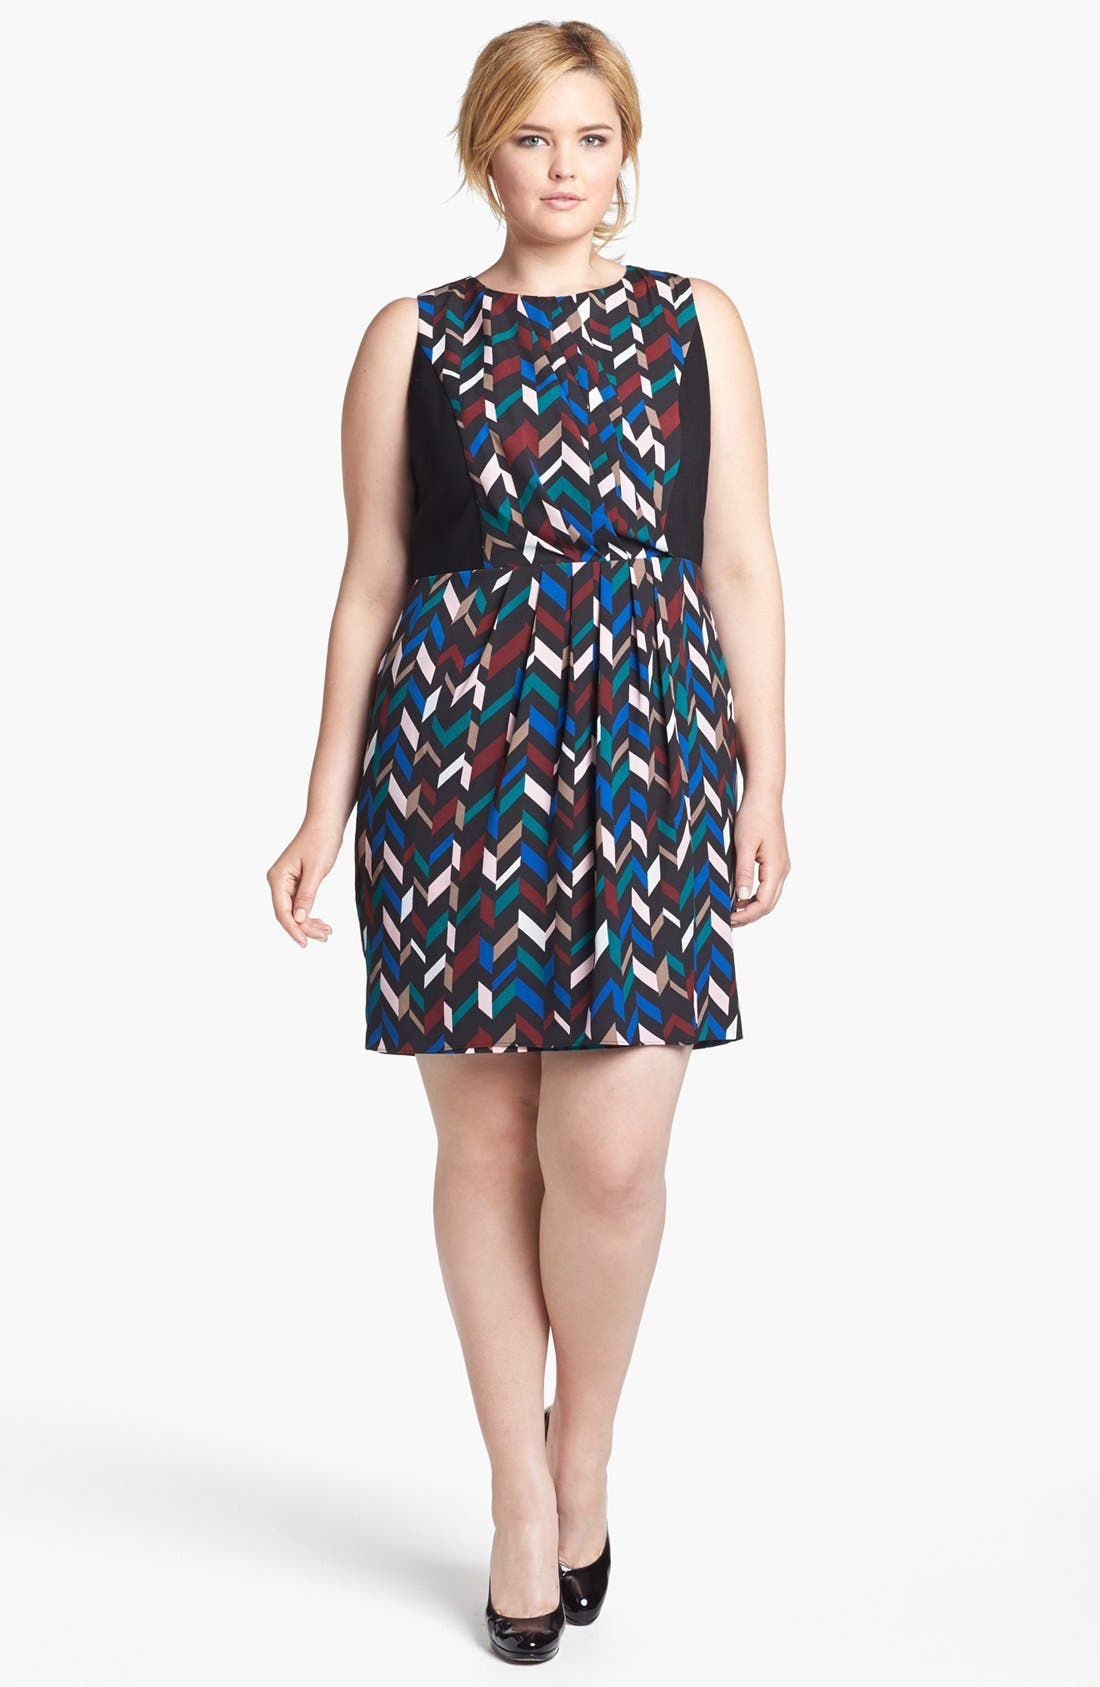 Alternate Image 1 Selected - DKNYC Geo Print Crepe Sheath Dress (Plus Size)